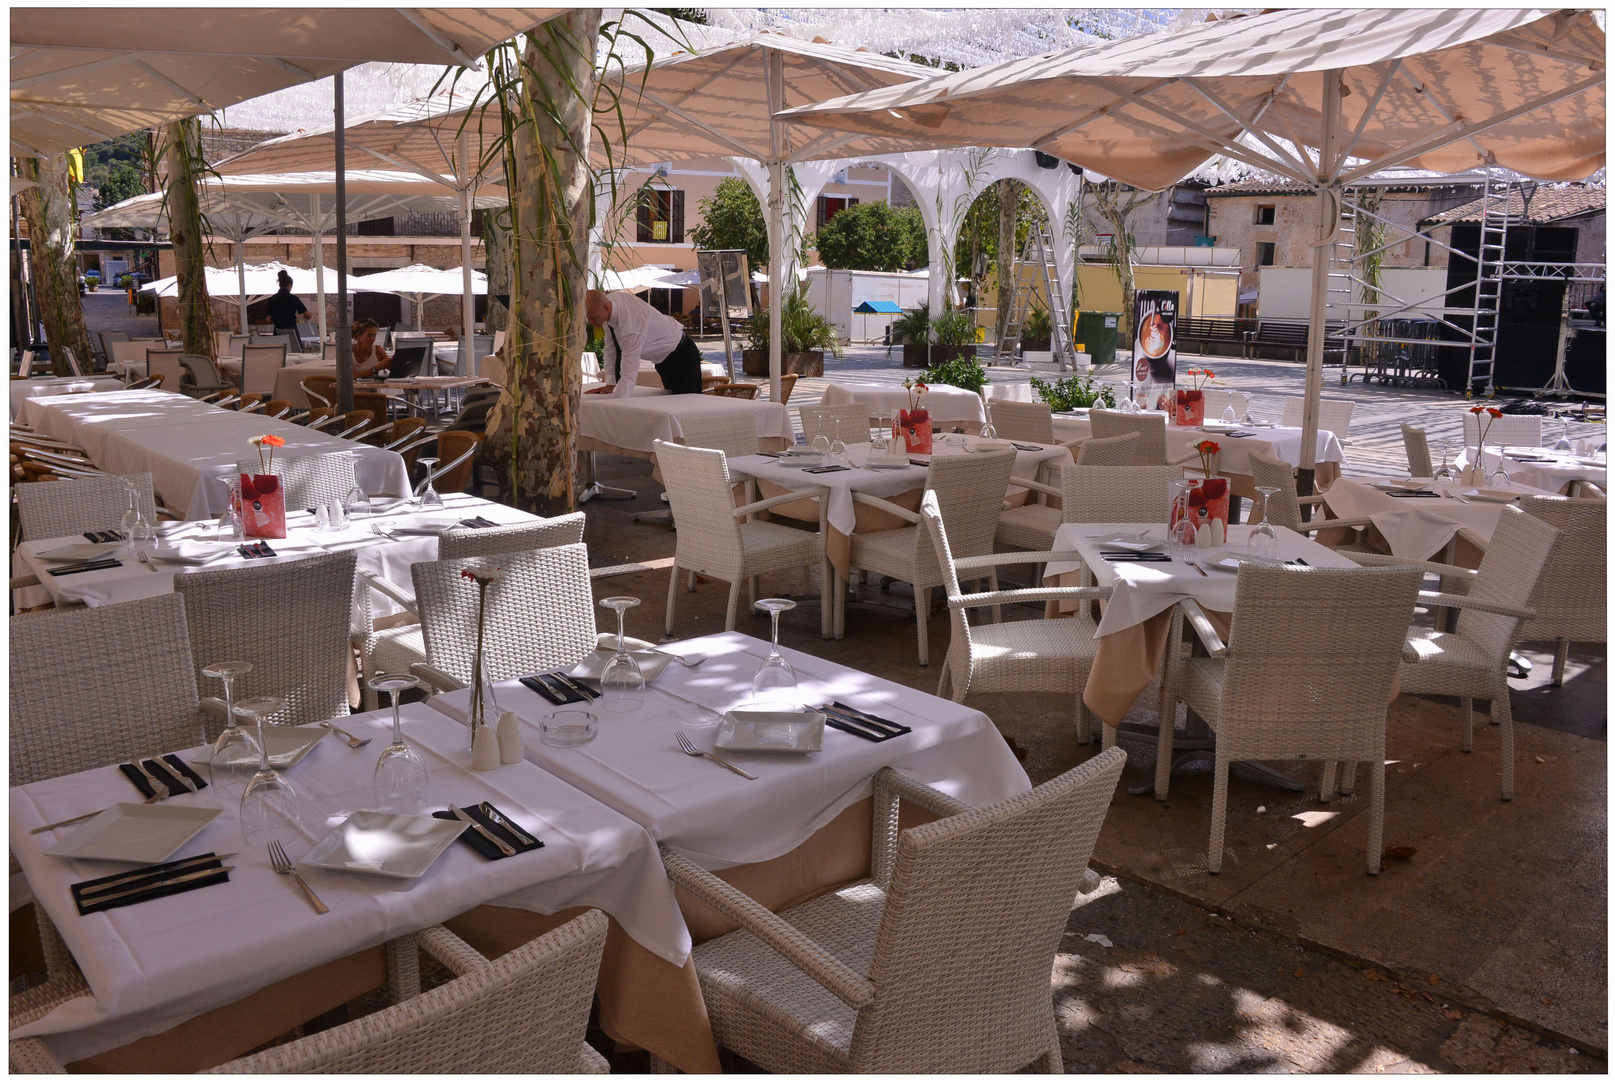 Mallorca 2012, Pollenca, preparando el día festivo